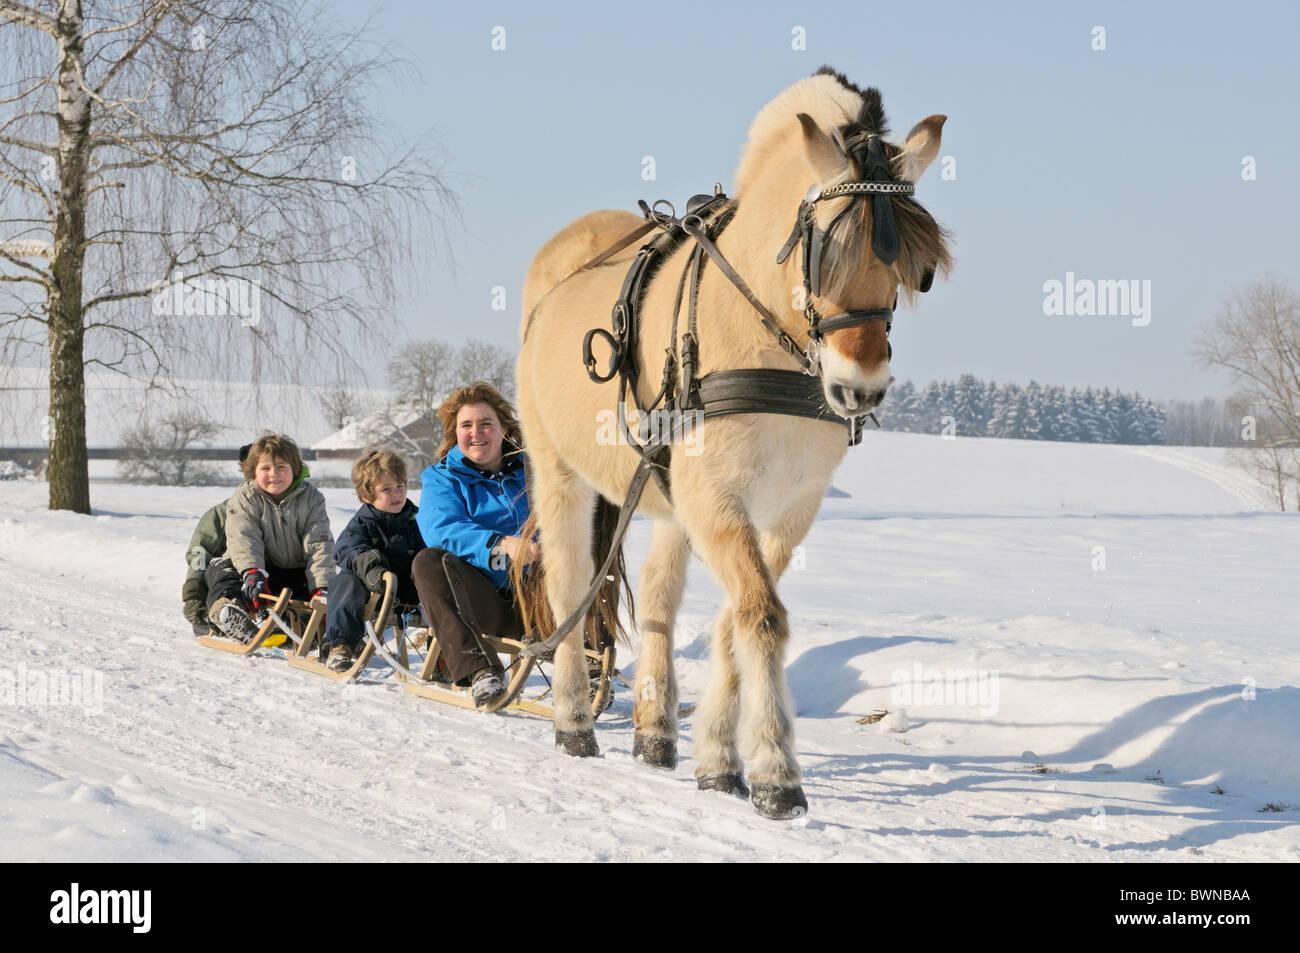 m u00e8re avec fils en carriole tir u00e9e par un cheval norv u00e9gien banque d u0026 39 images  photo stock  33046674